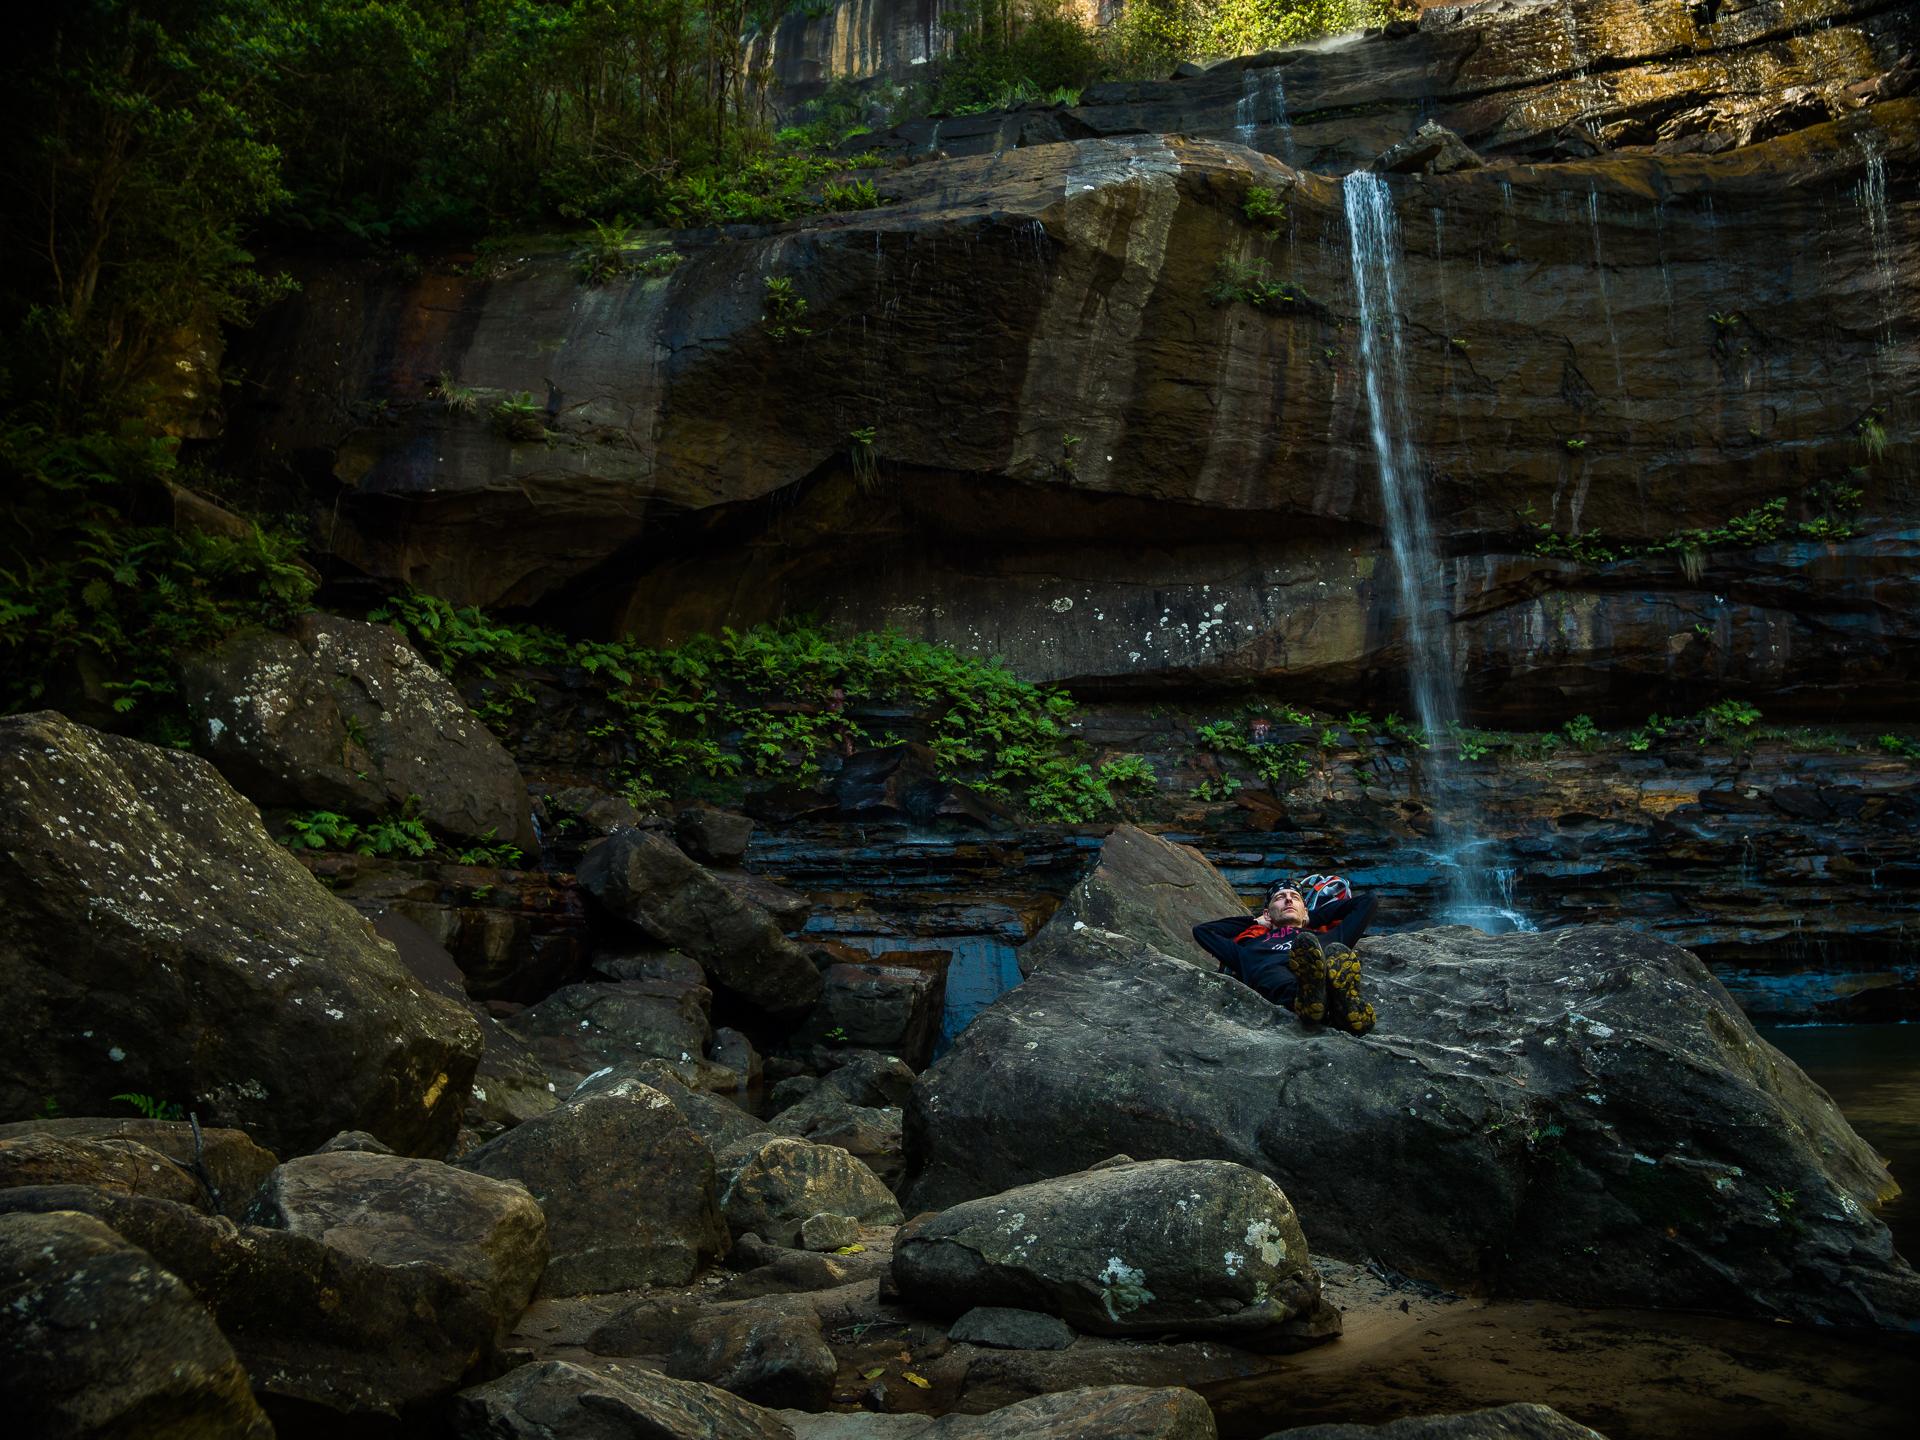 Geriatric Hiker